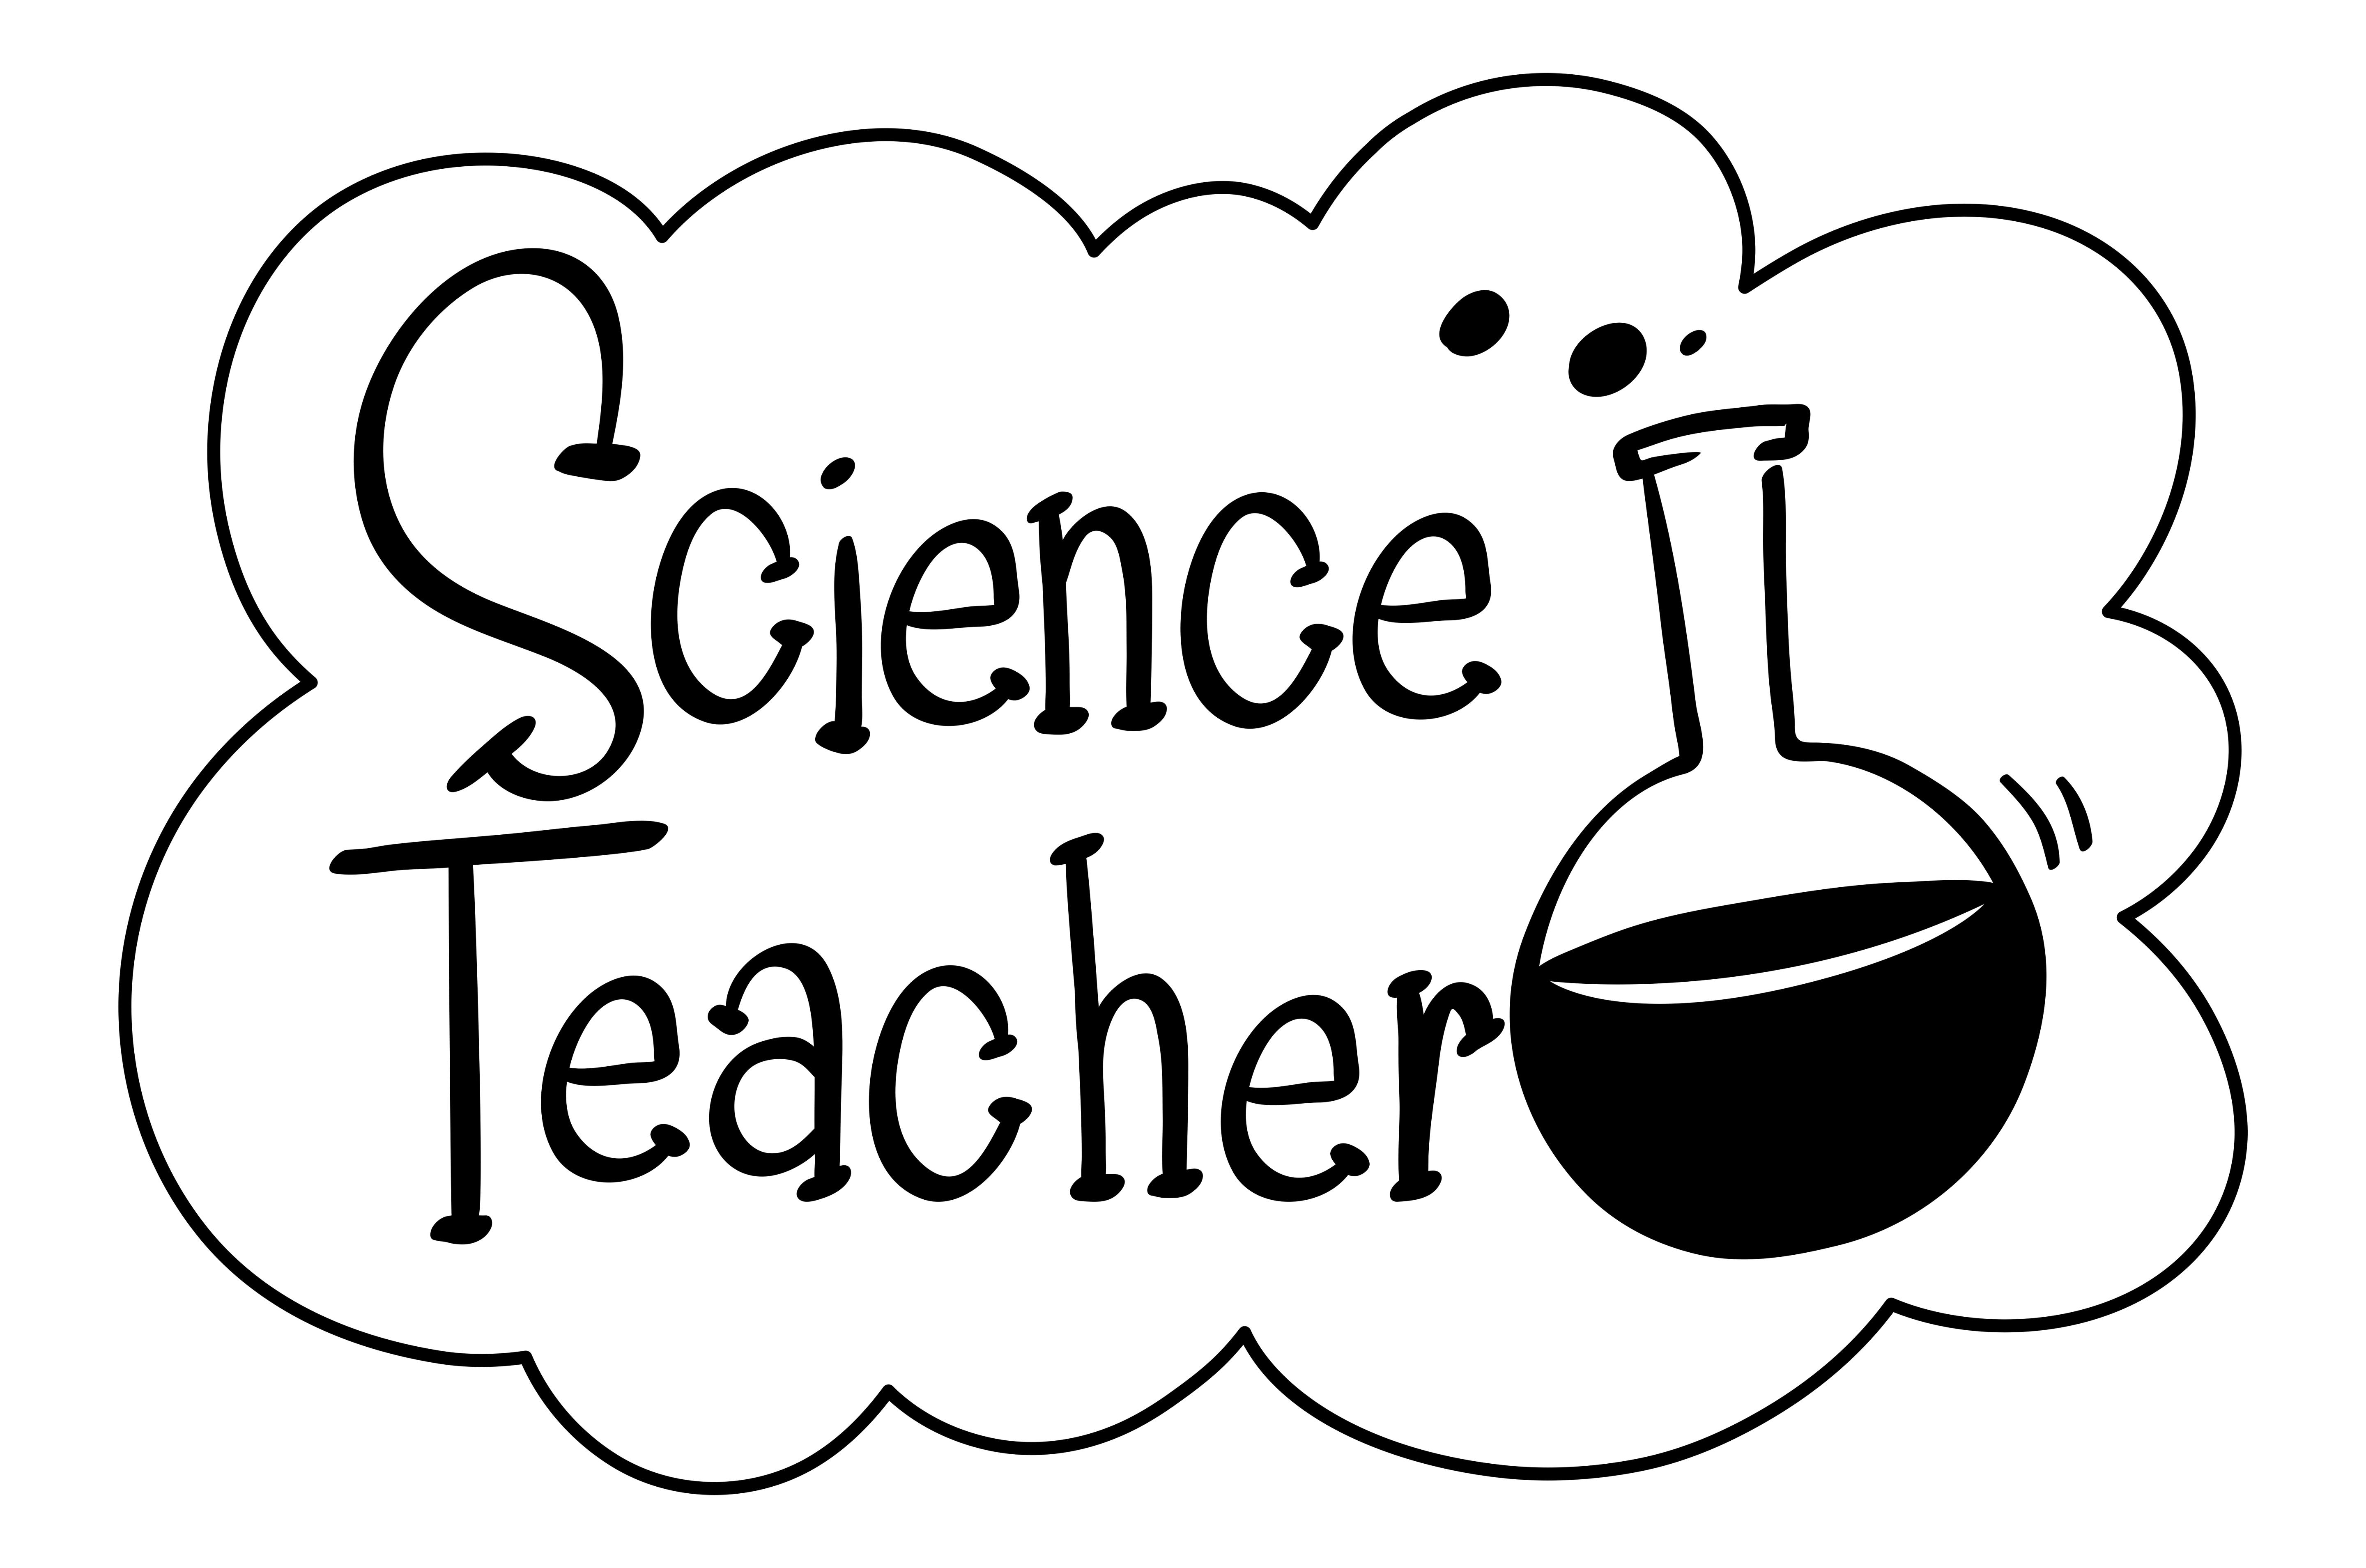 English Phrase For Science Teacher